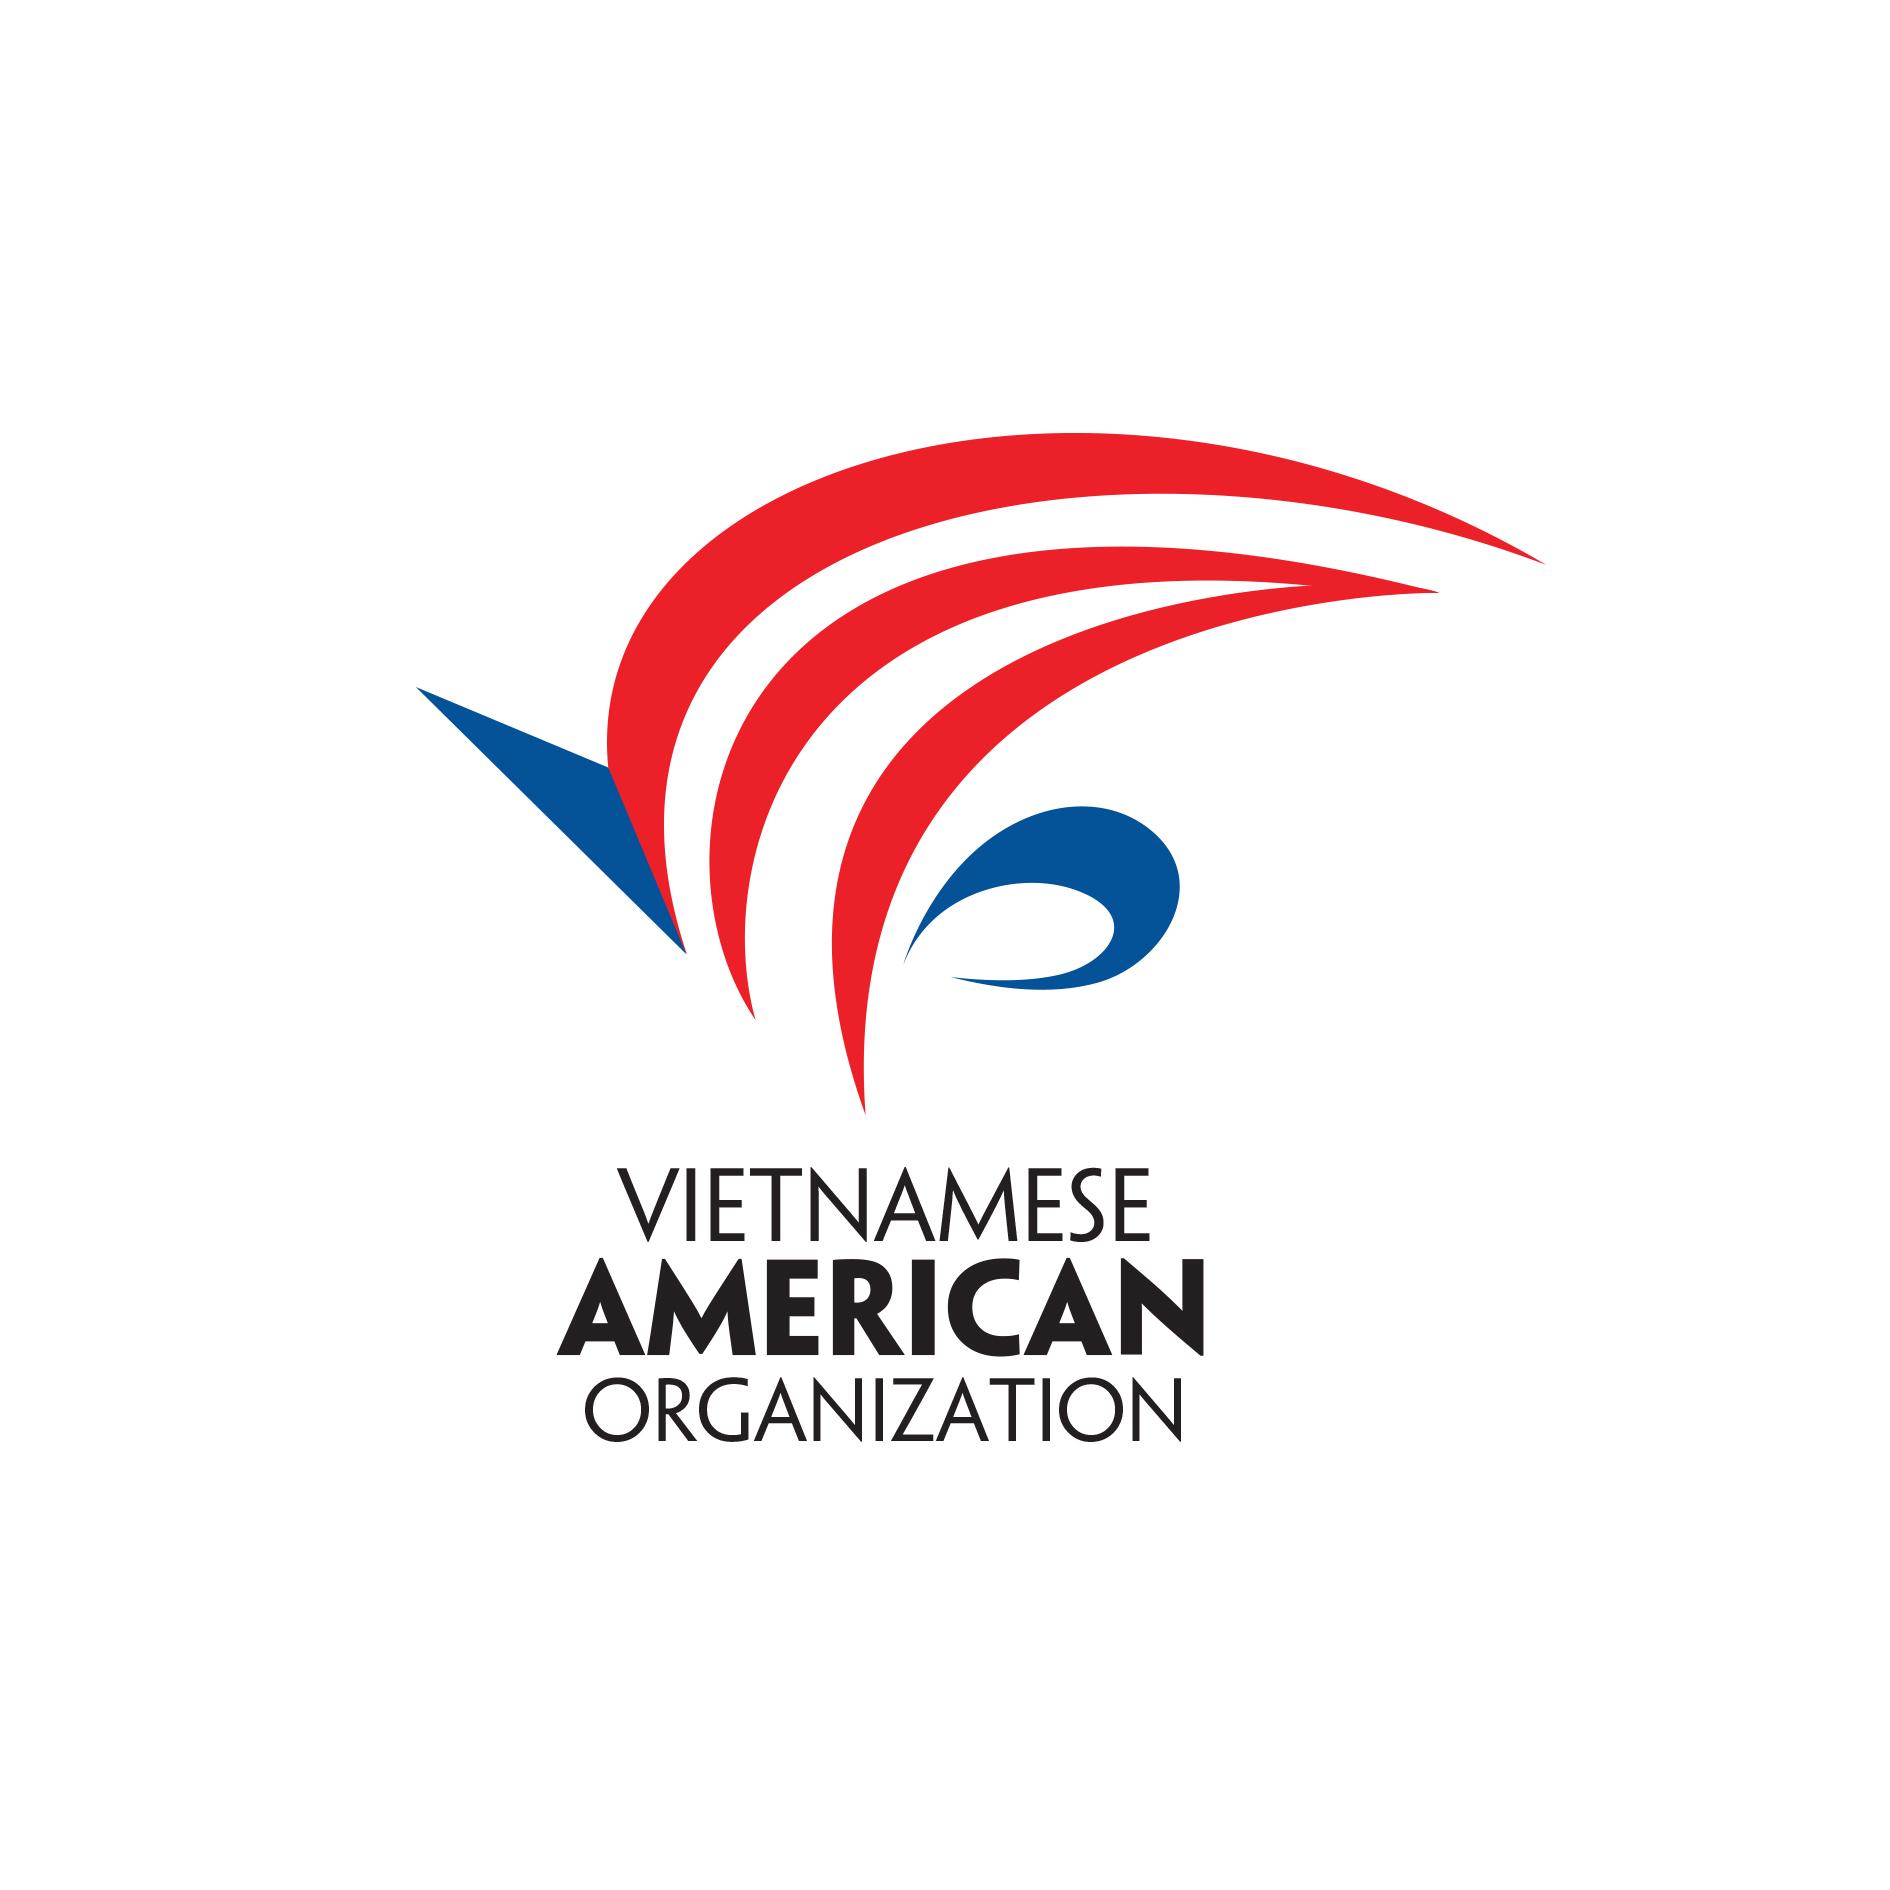 VAO - Vietnamese American Organization   VAO, Vietnamese American Organization, is a nonprofit organization for Vietnamese American people in California, USA.